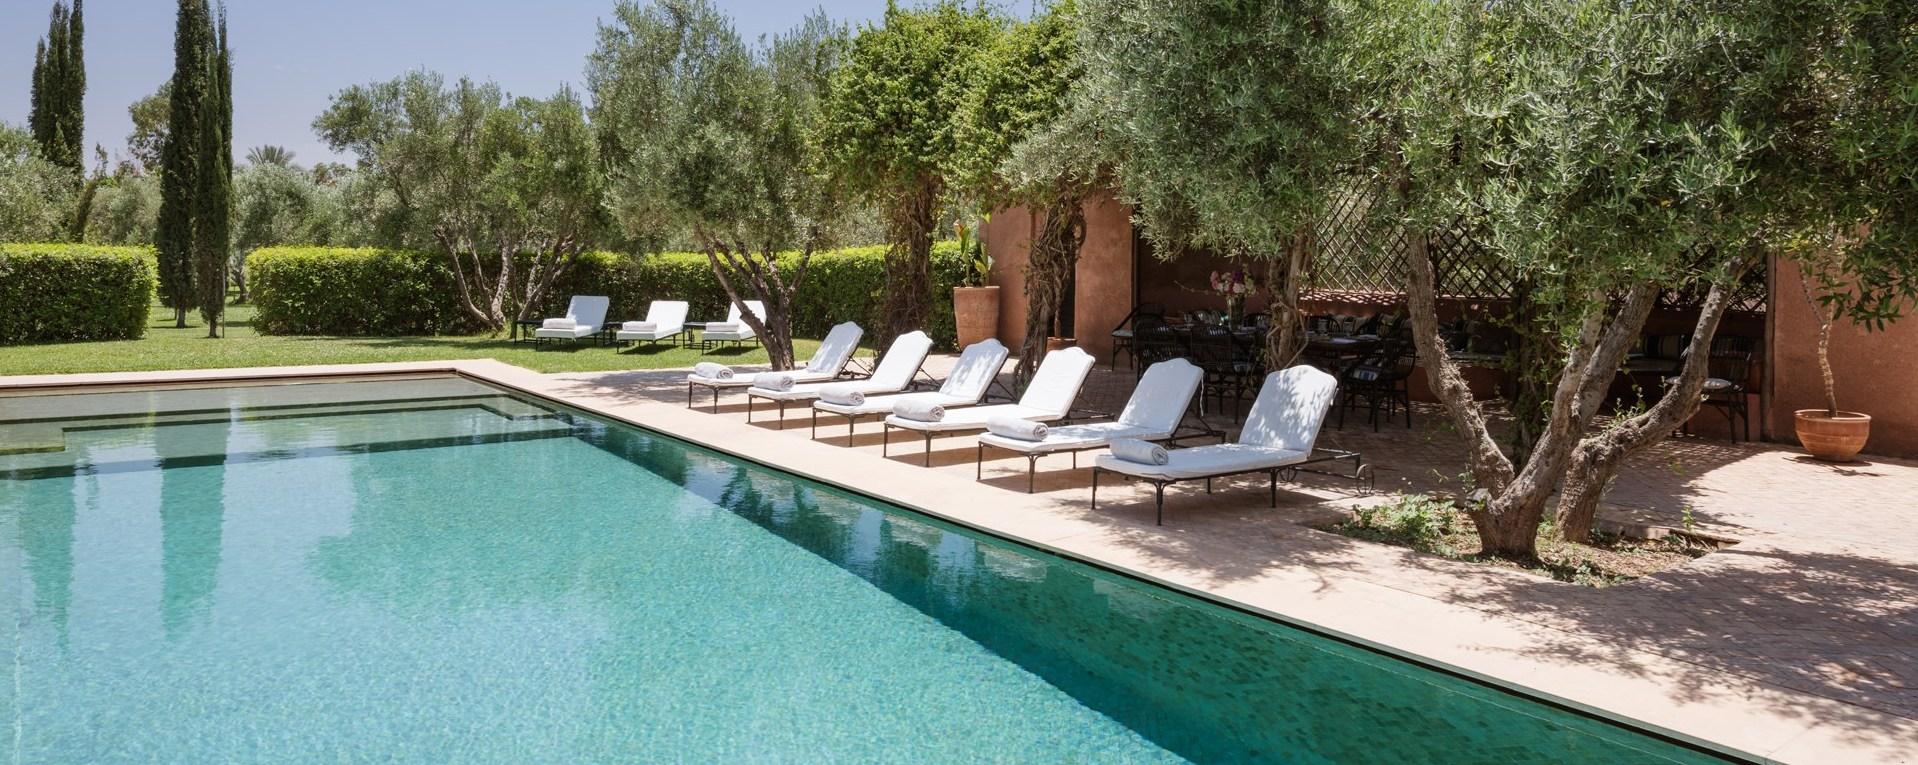 large-luxury-pool-villa-marrakech